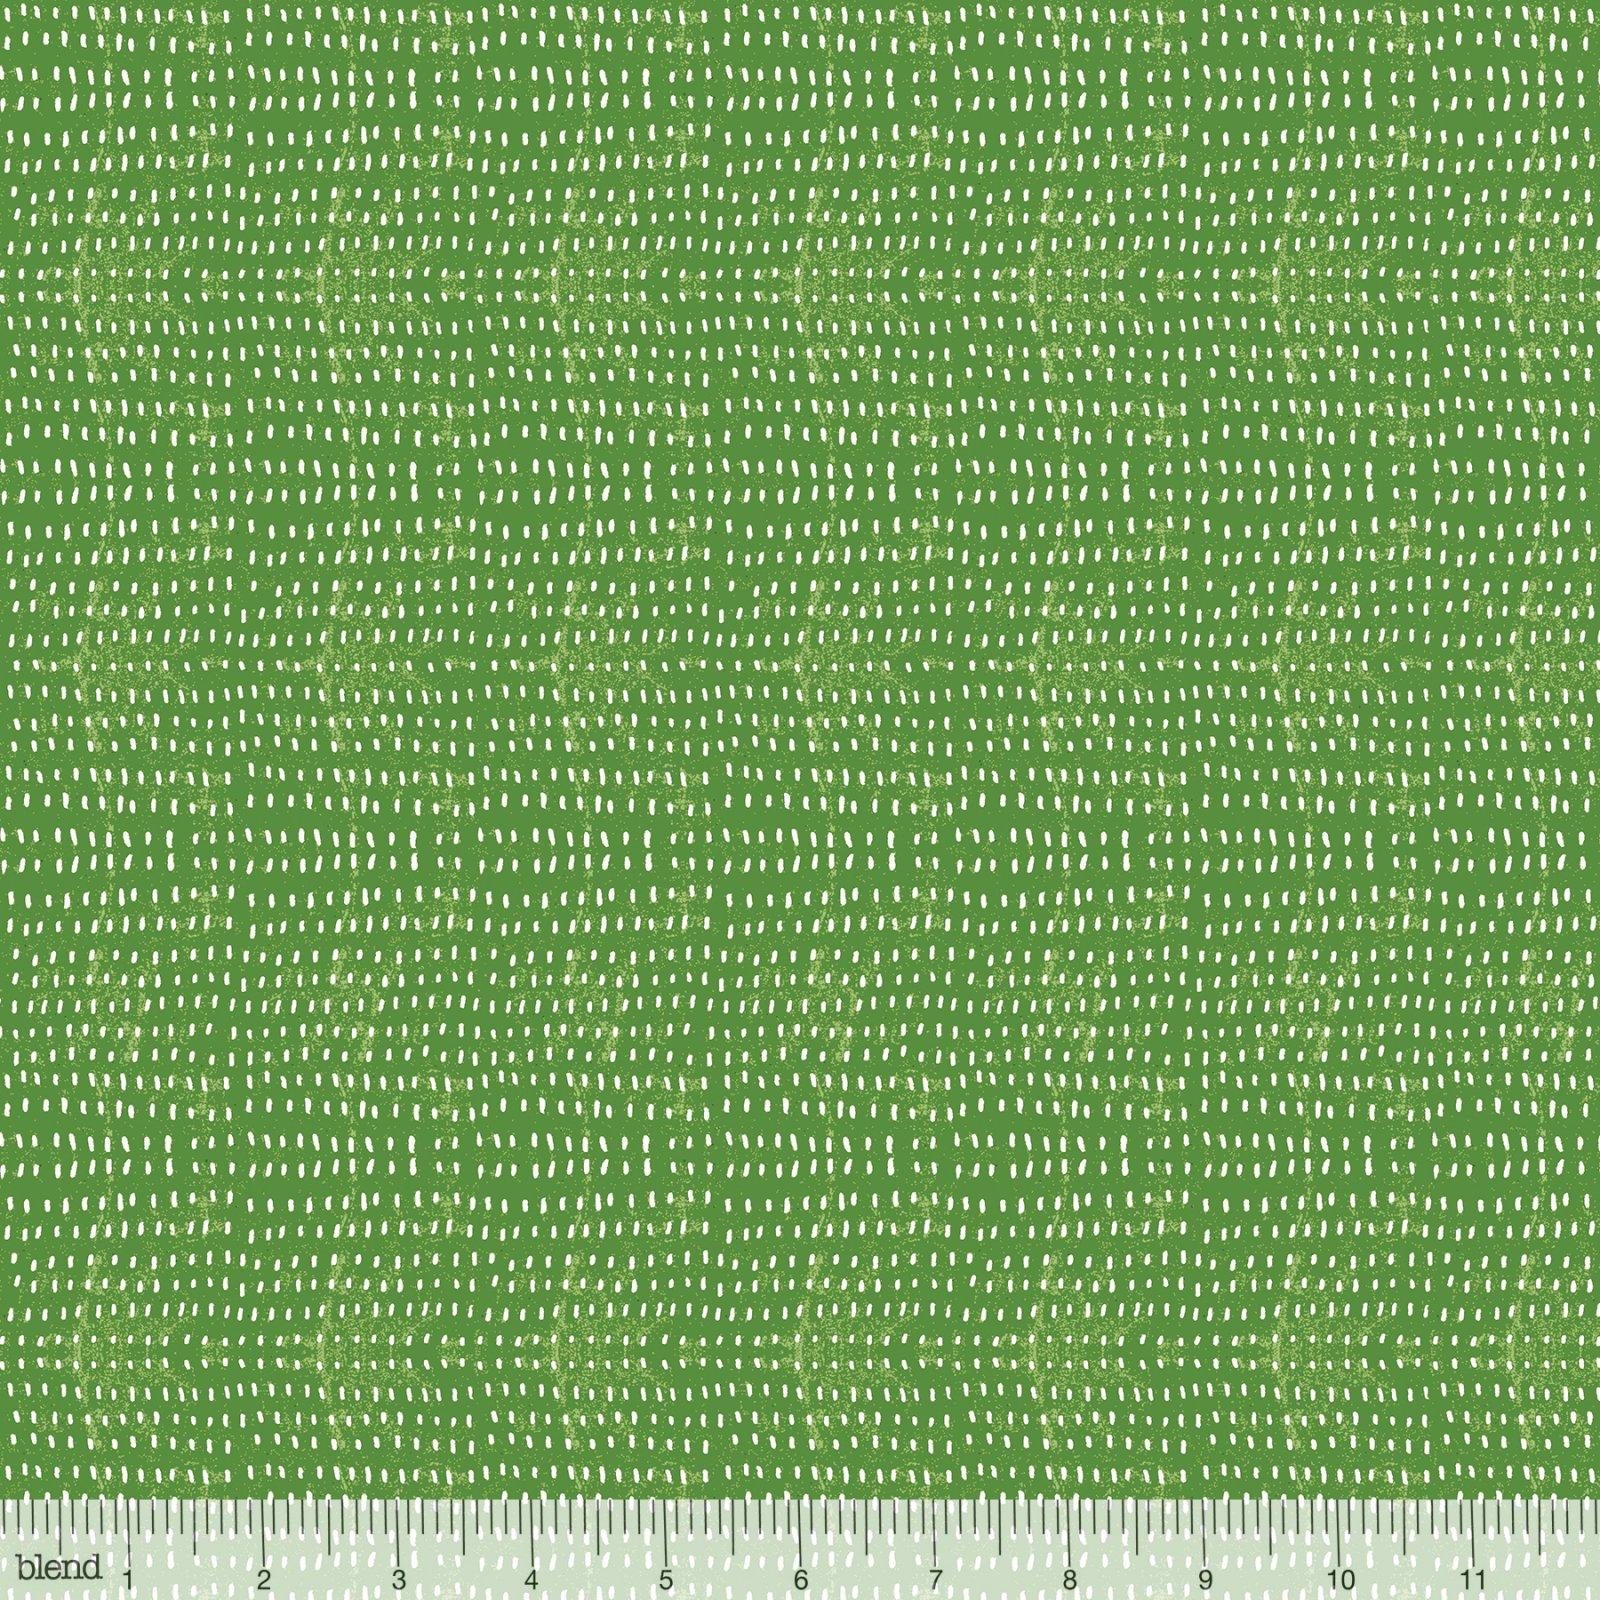 112.114.08 Grass Seeds Cori Dantini Blend Fabrics